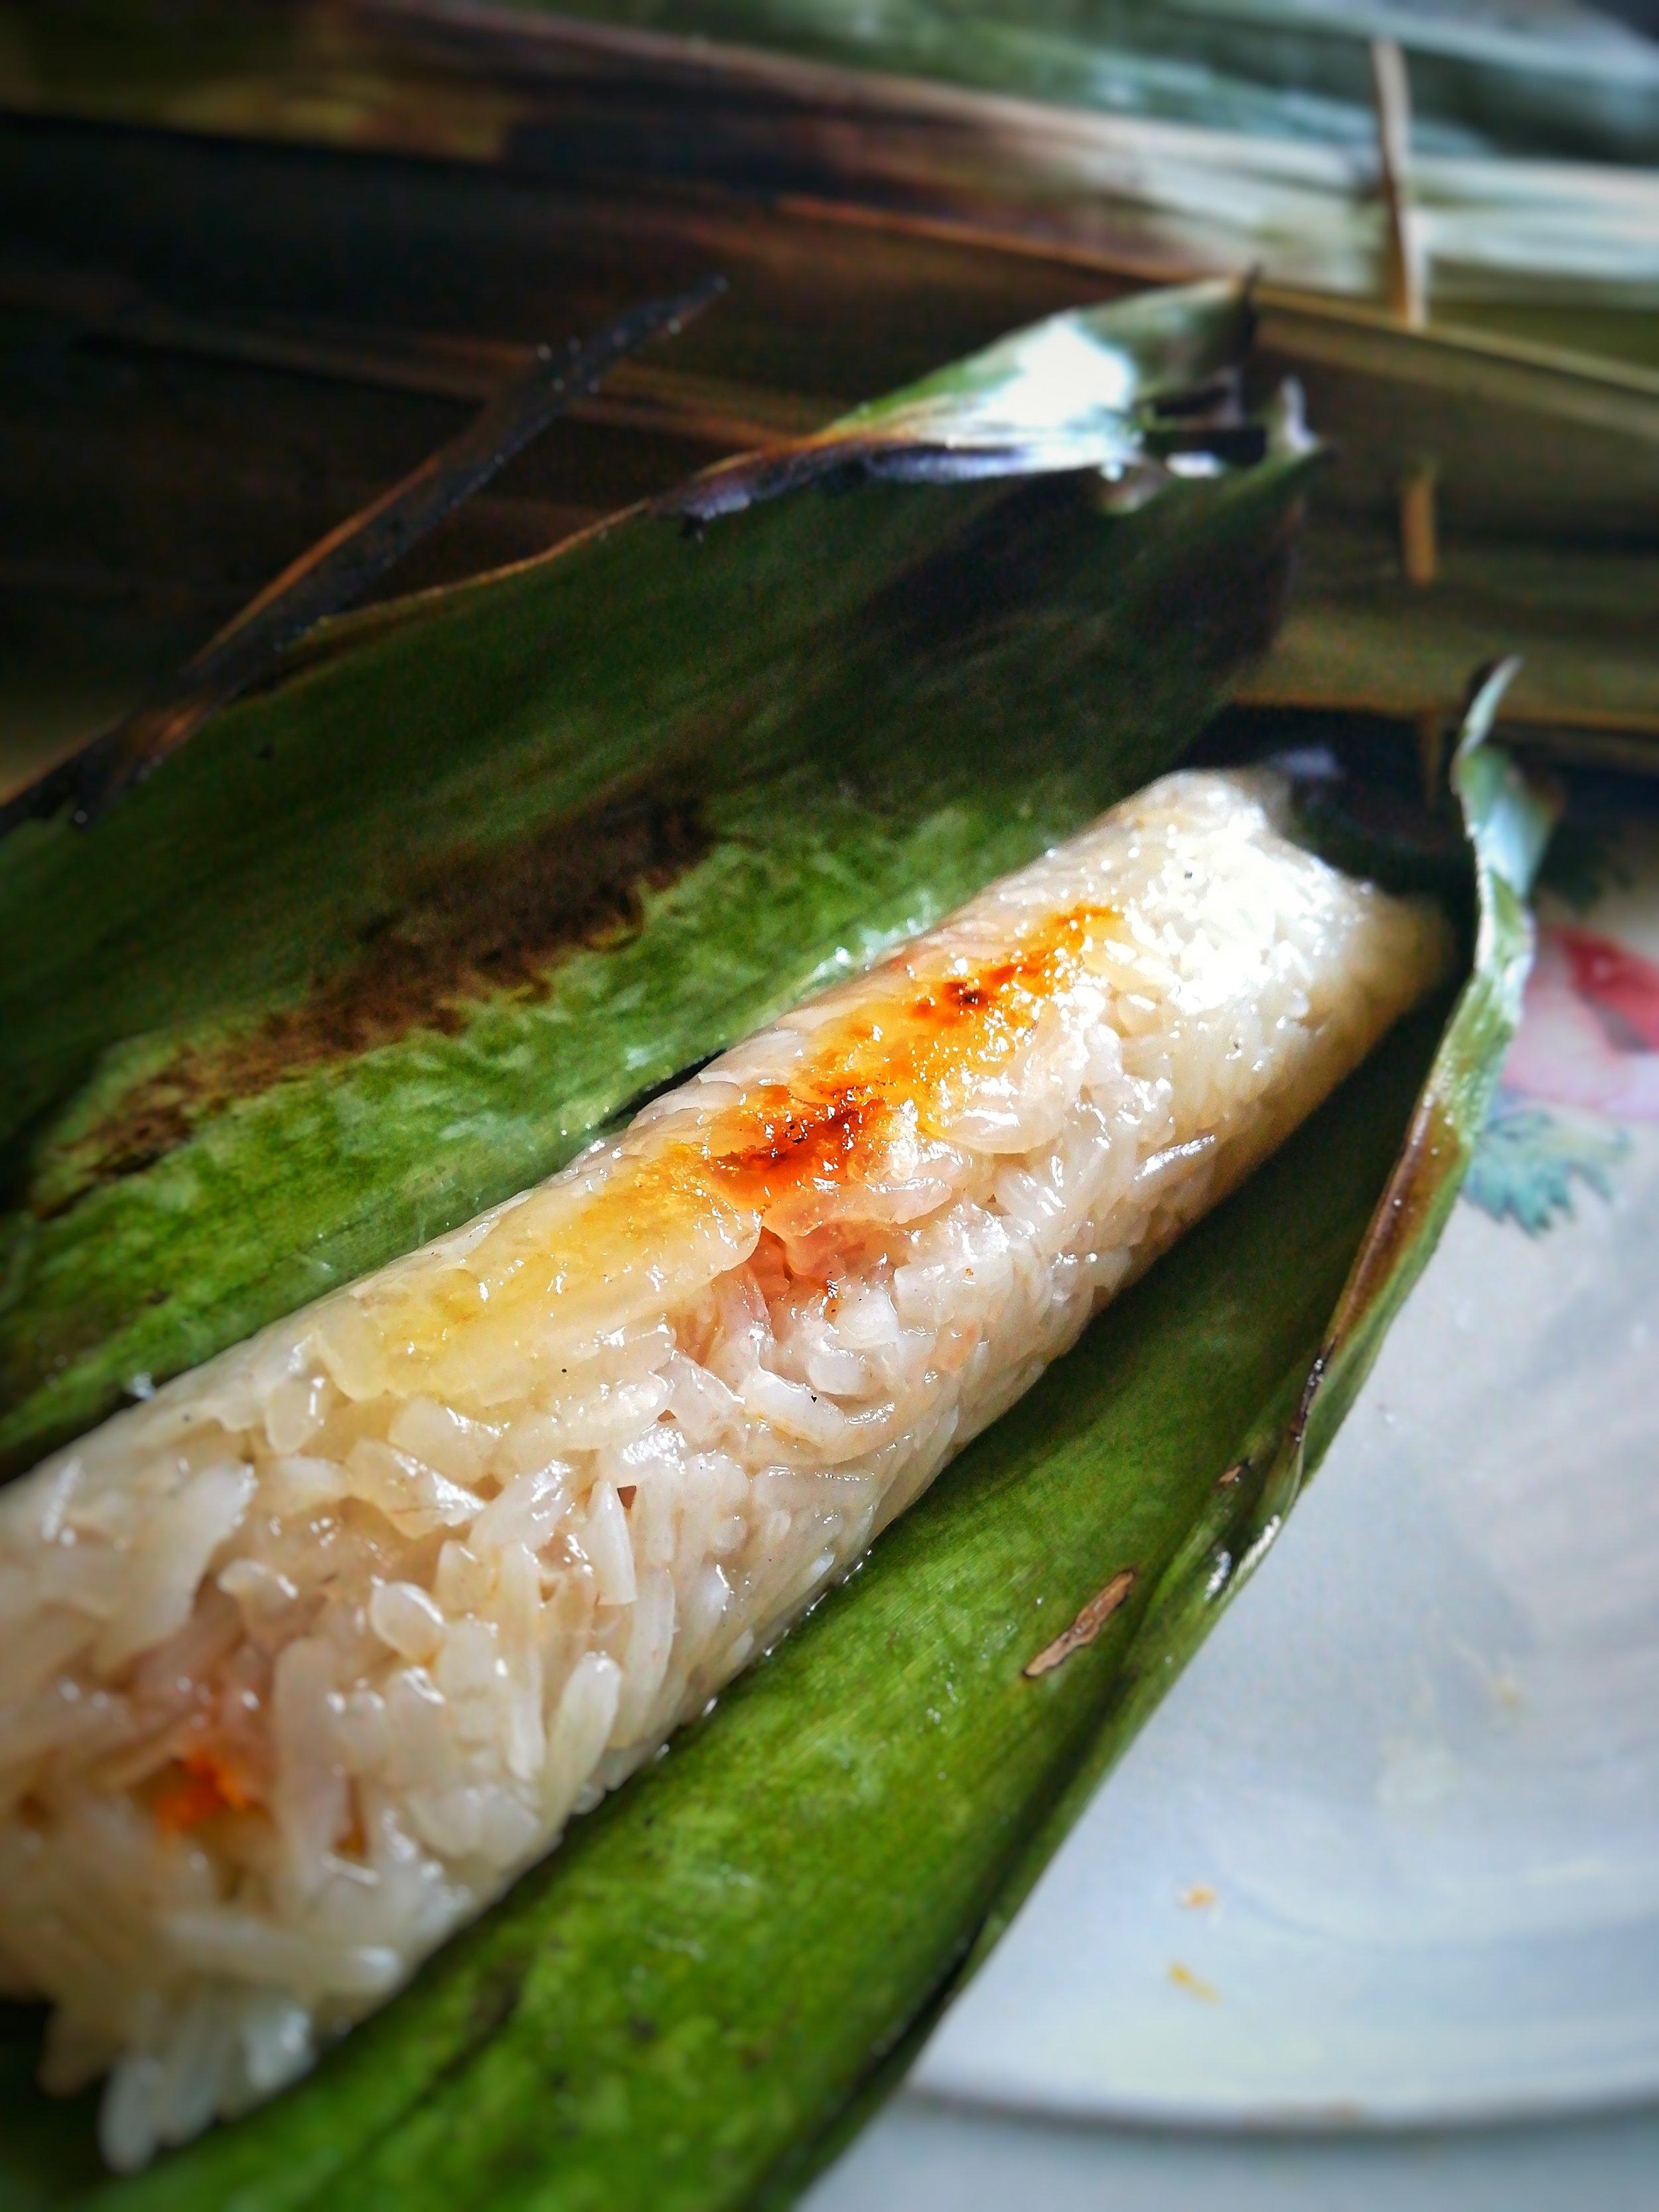 hop penang ramadan wrap malay kueh snack pulut udang